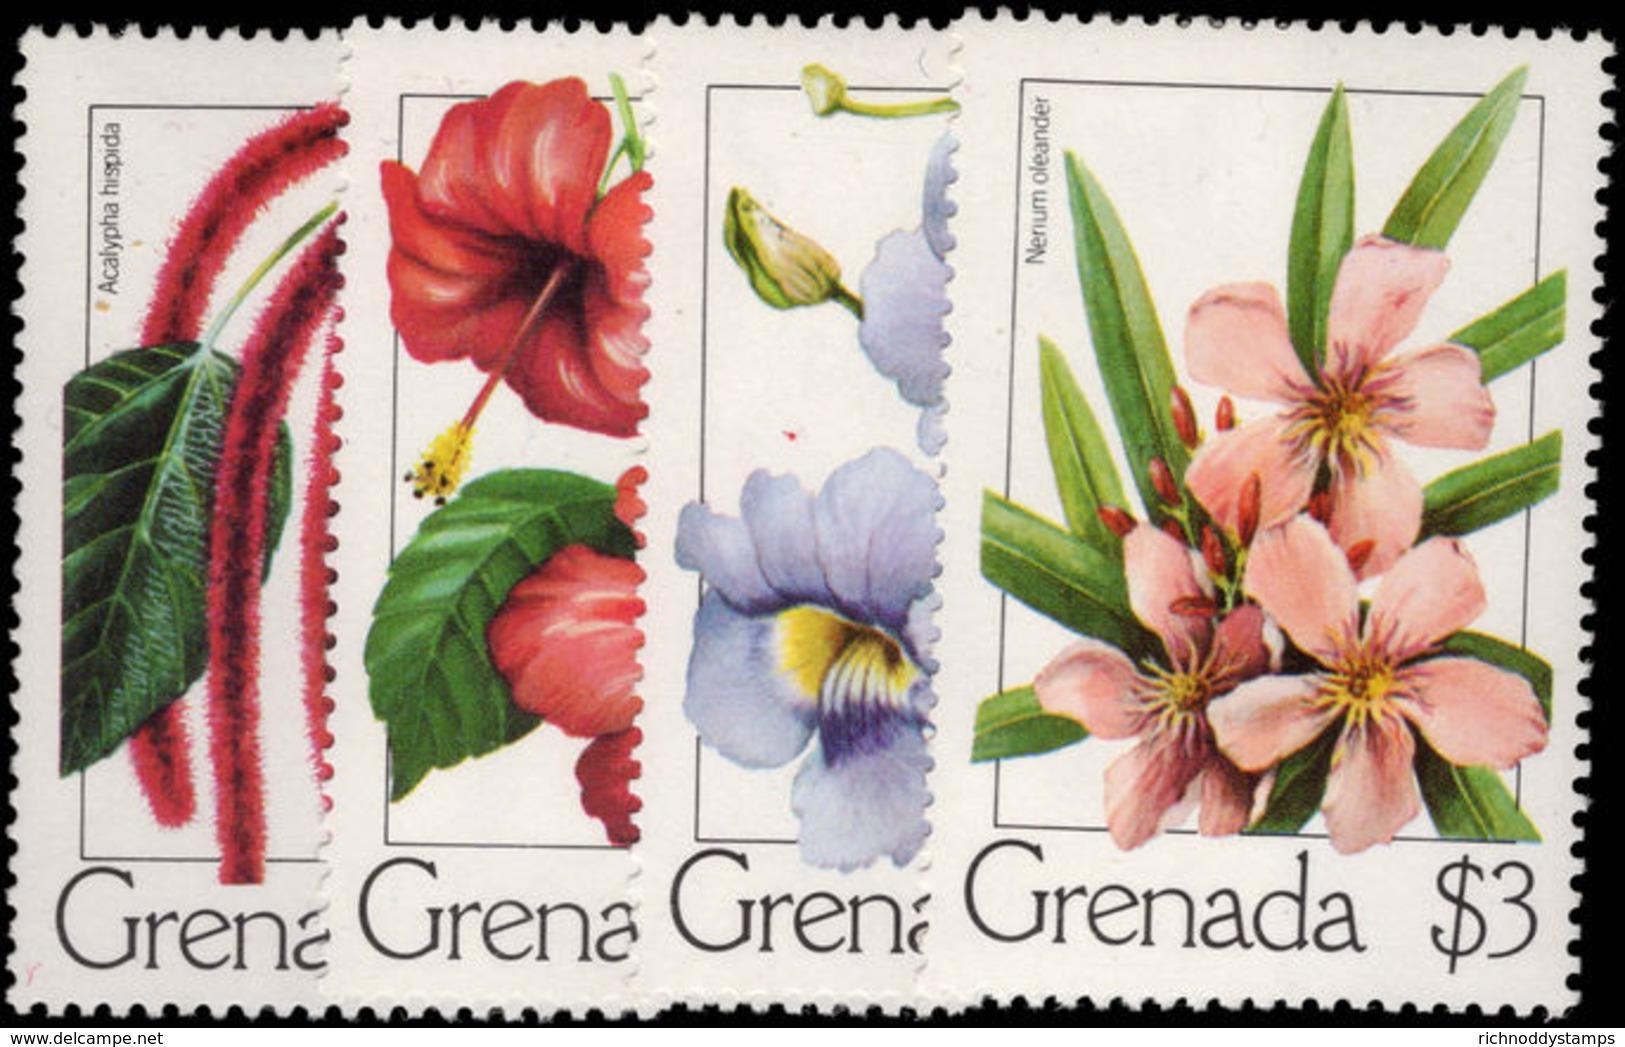 Grenada 1979 Flowers Unmounted Mint. - Grenada (1974-...)